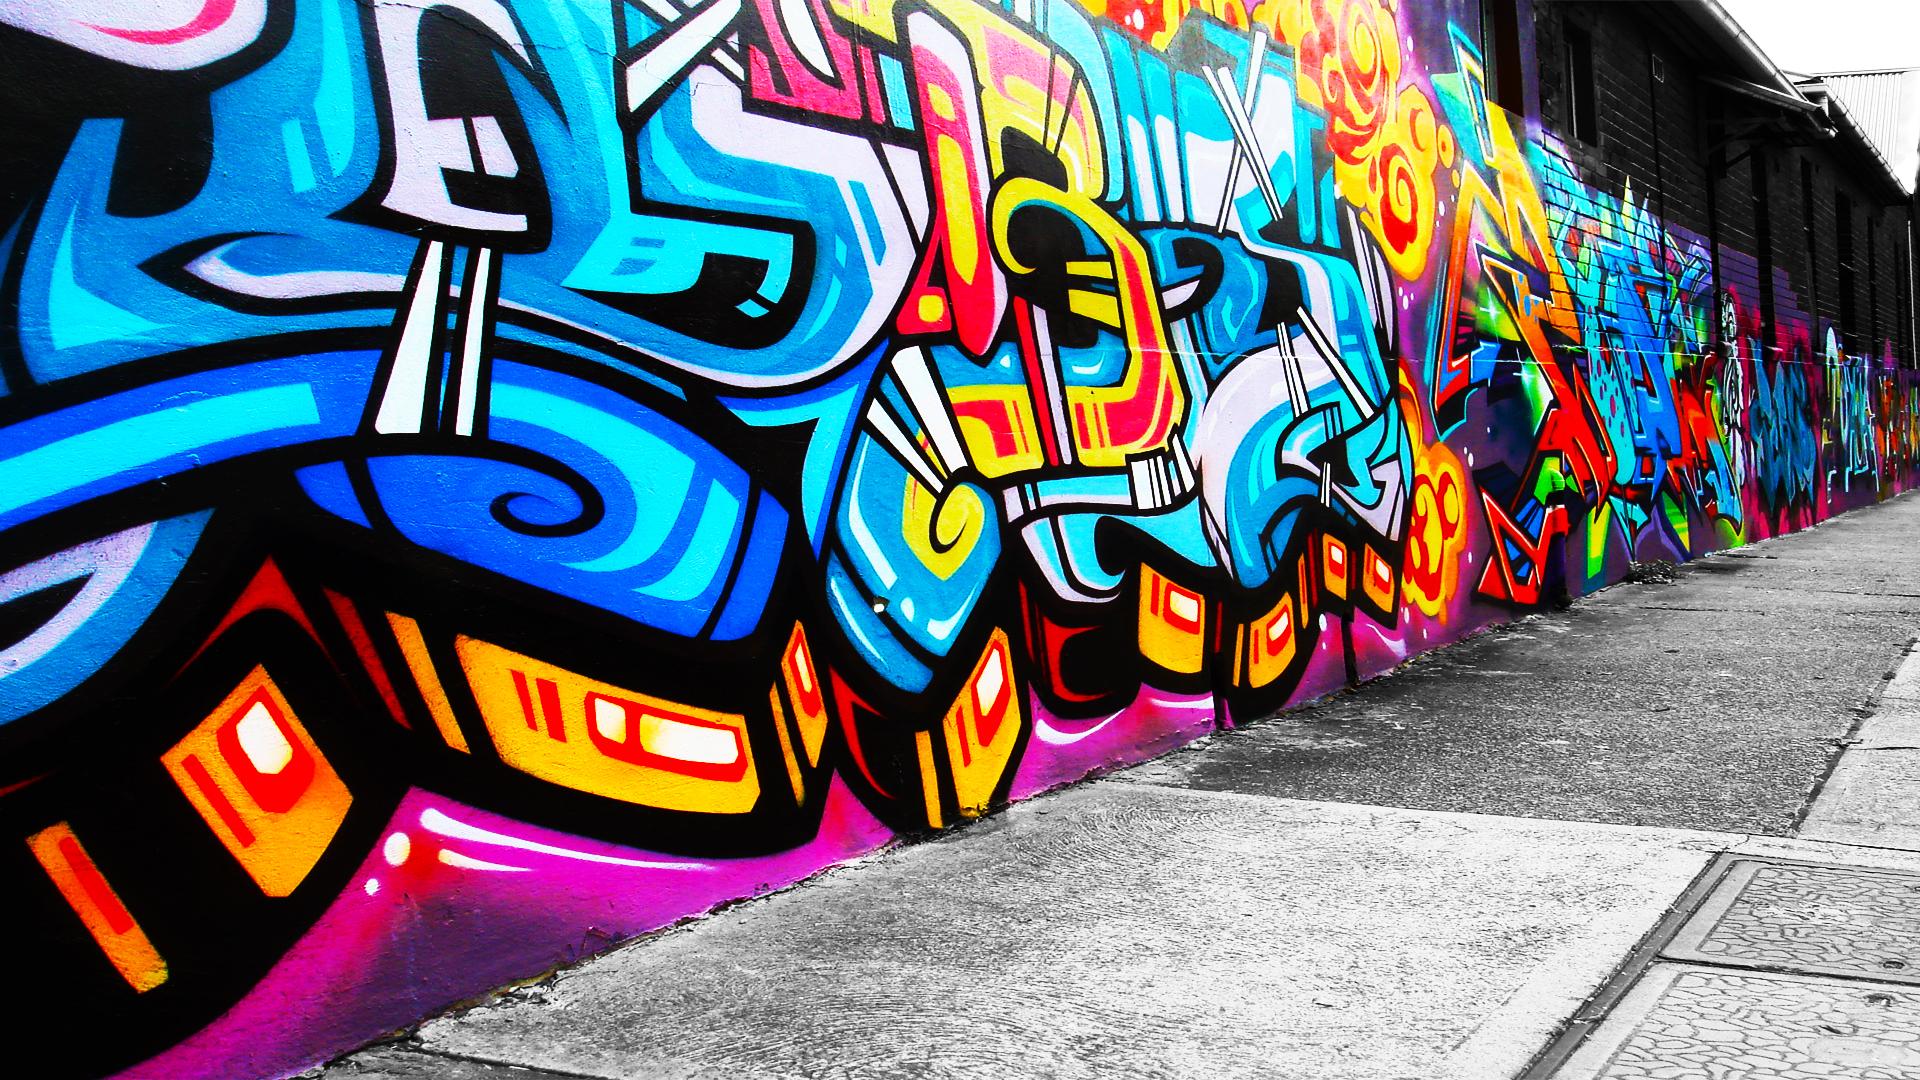 grafitti wallpaper: